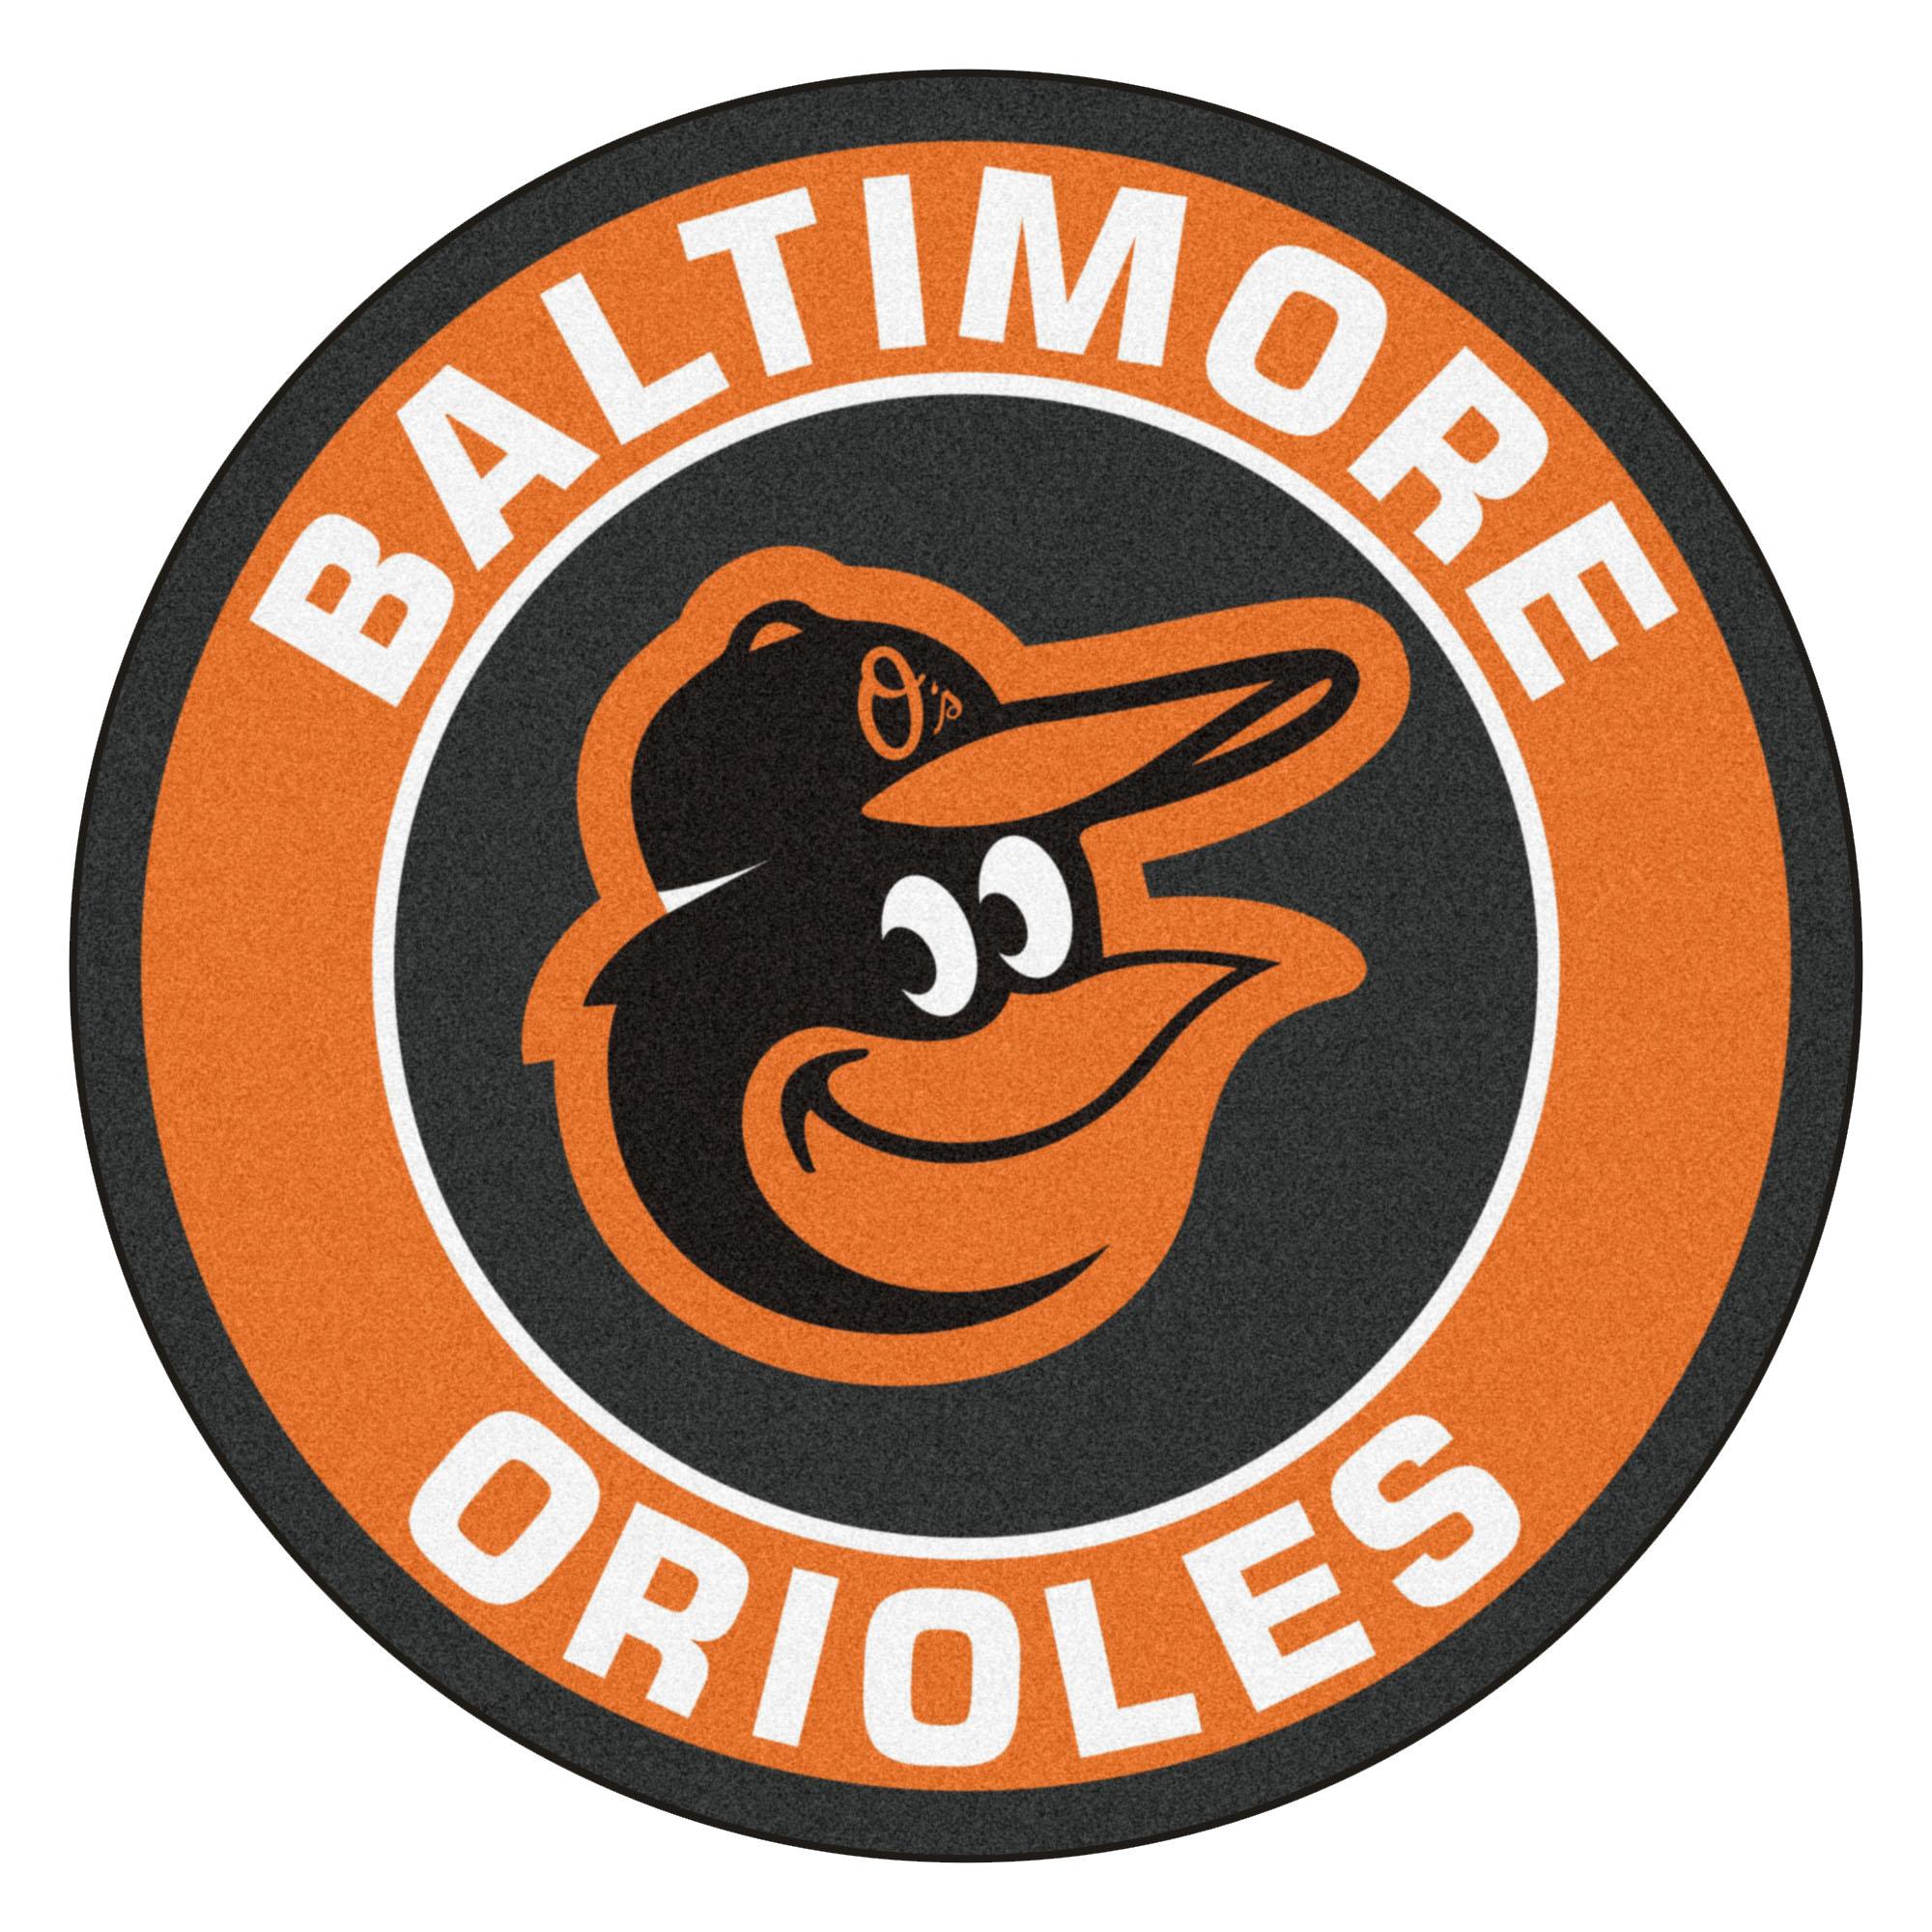 High Resolution Wallpaper | Baltimore Orioles 2000x2000 px